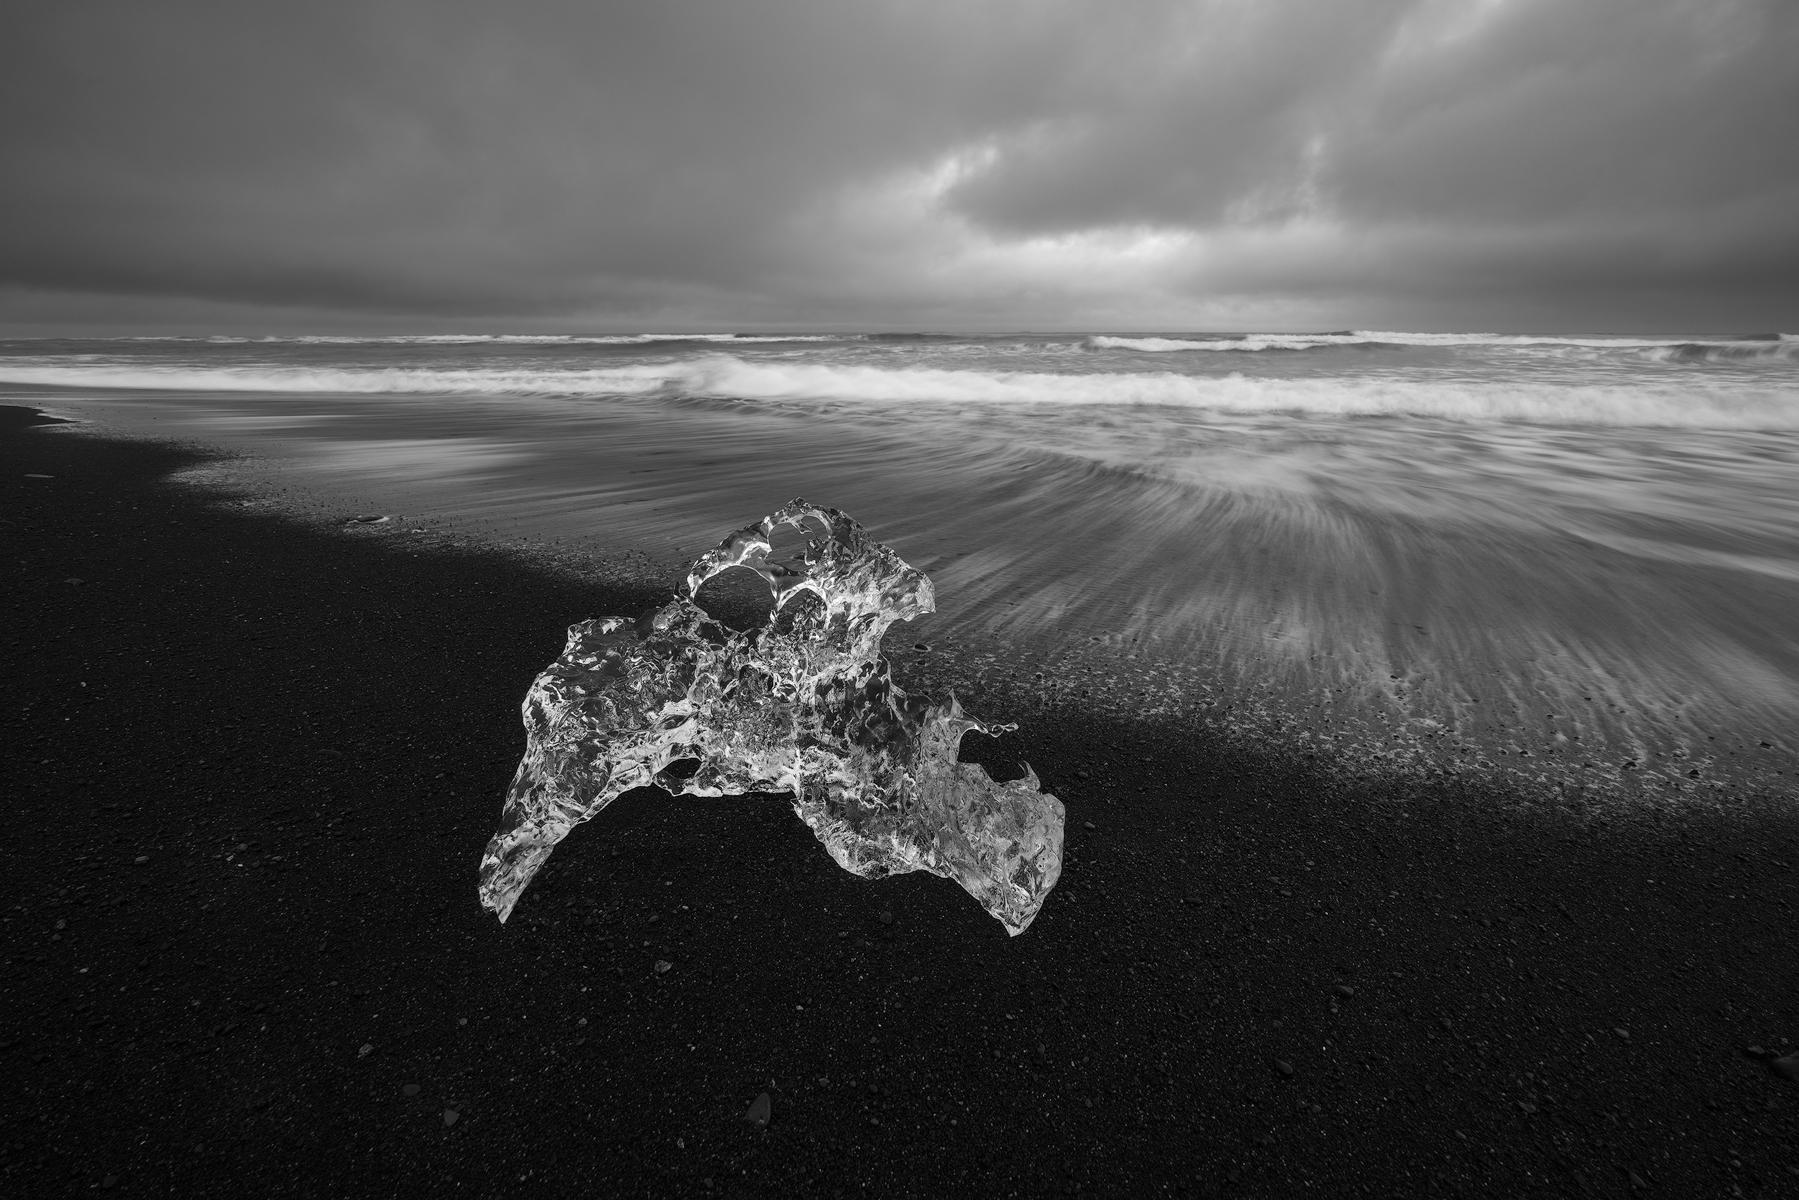 Sculpted Ice, Jölkusárlón Ice Beach, | Sony a7RII and a Voigtlander 15mm f4.5 Heliar III | Image Exposed at ISO 100 at f11 for 1 Second.